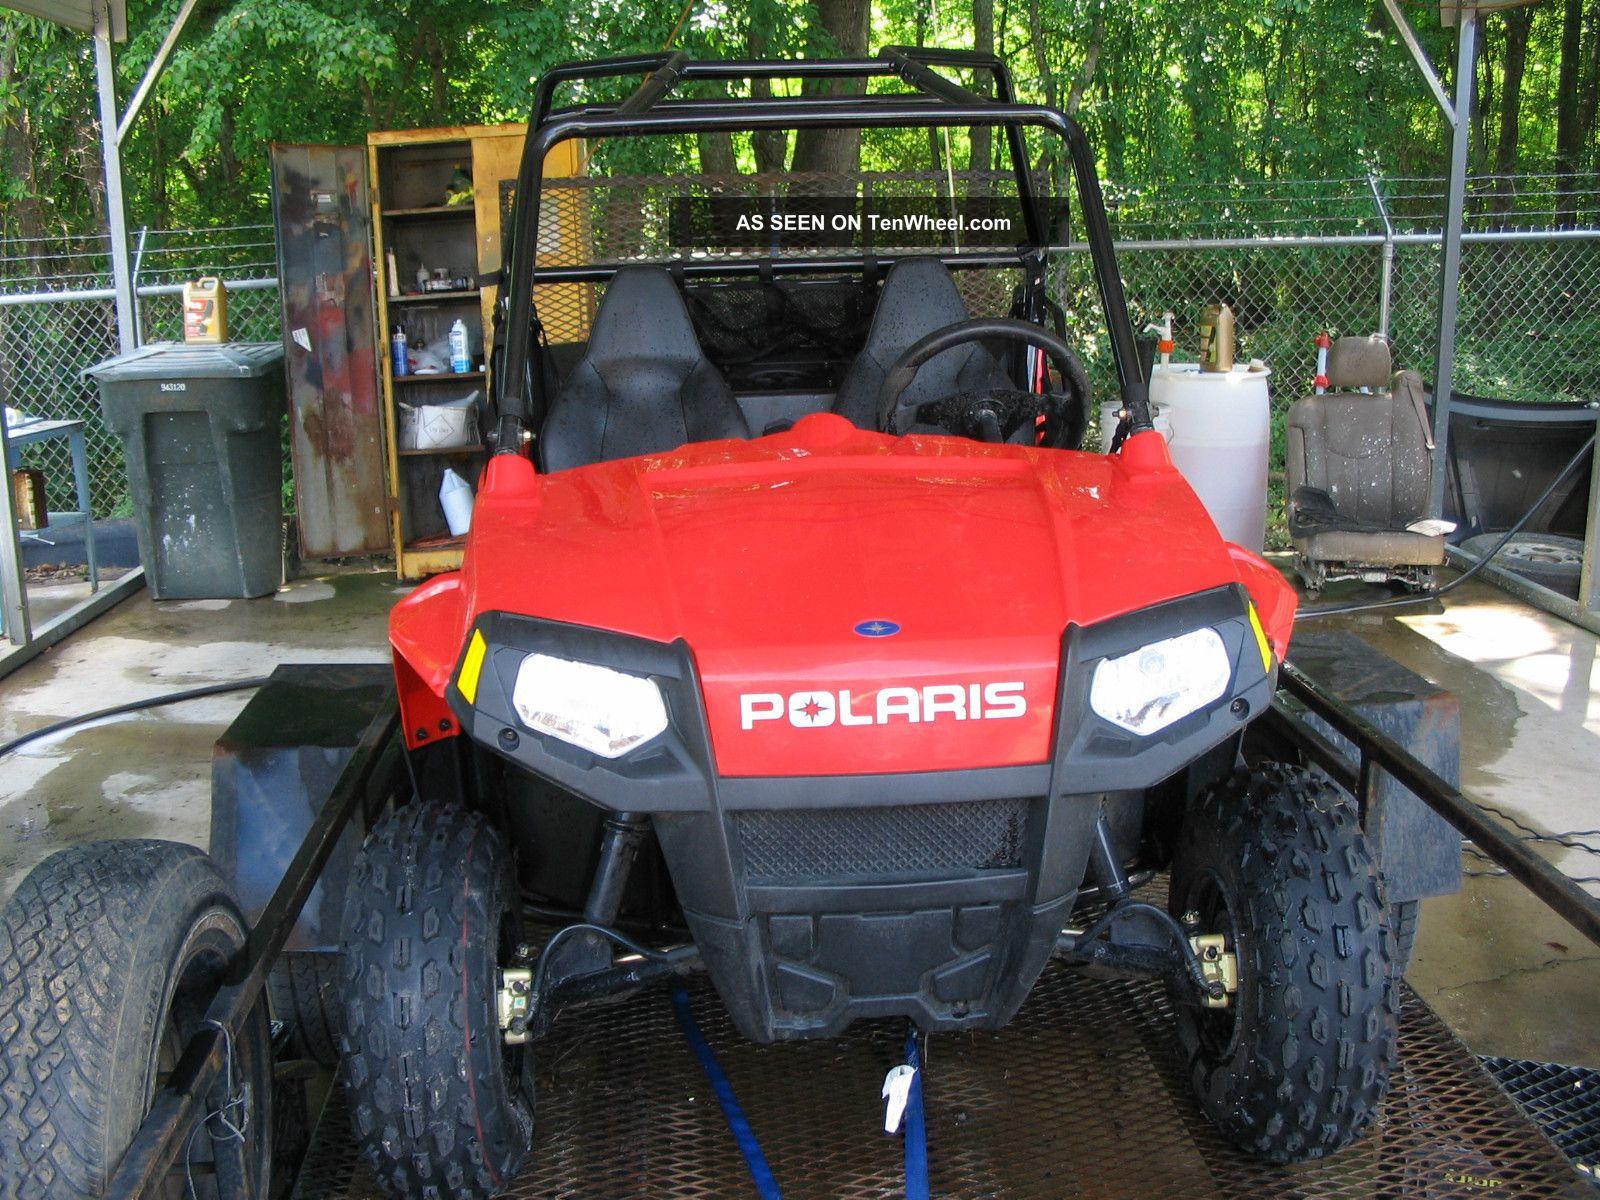 Search Results Polaris Rzr 170 Ebay Electronics Cars ... - photo#21